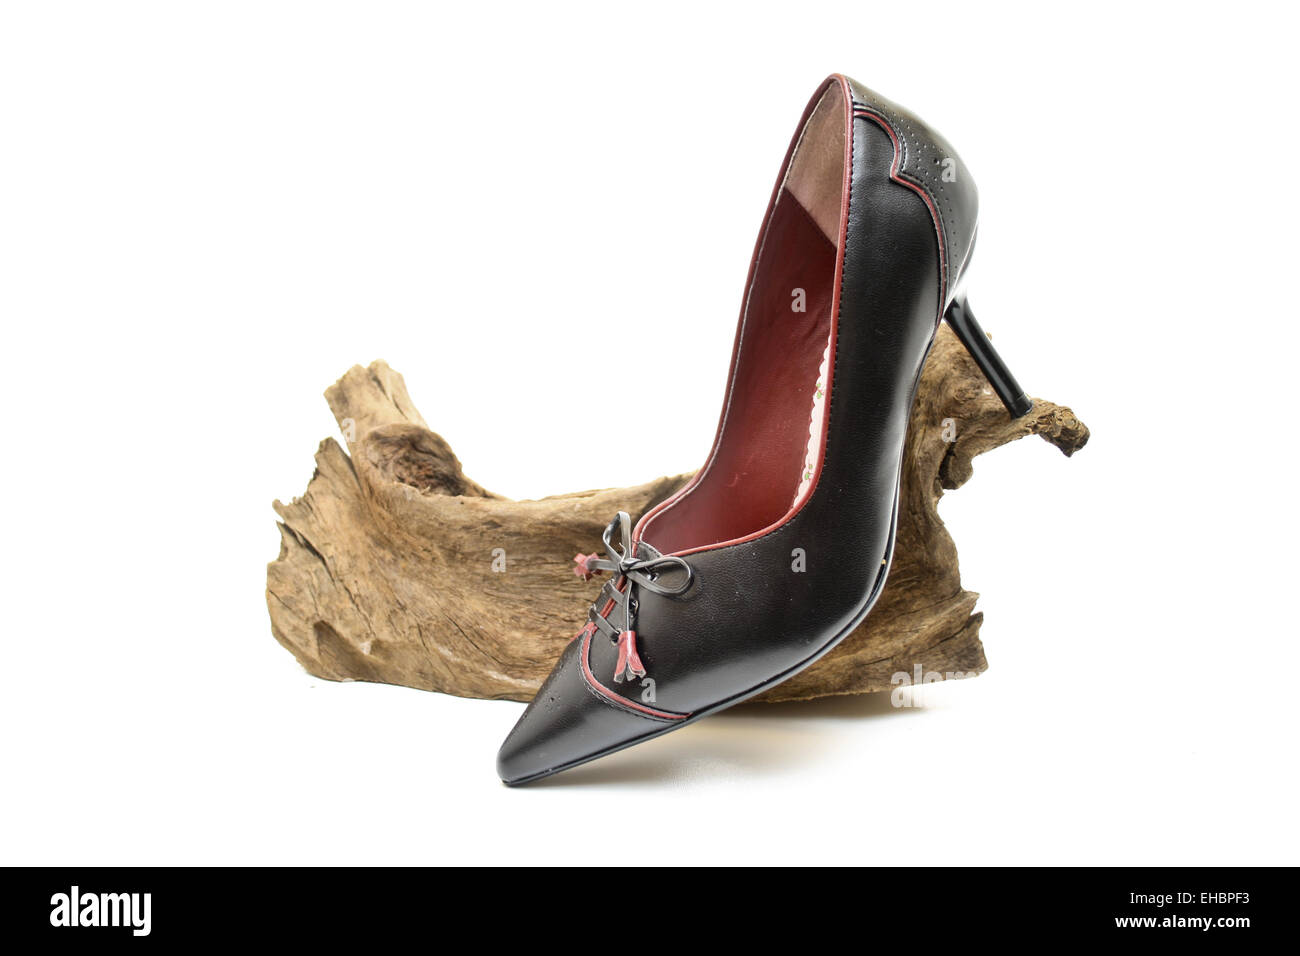 Ladies shoes - Stock Image